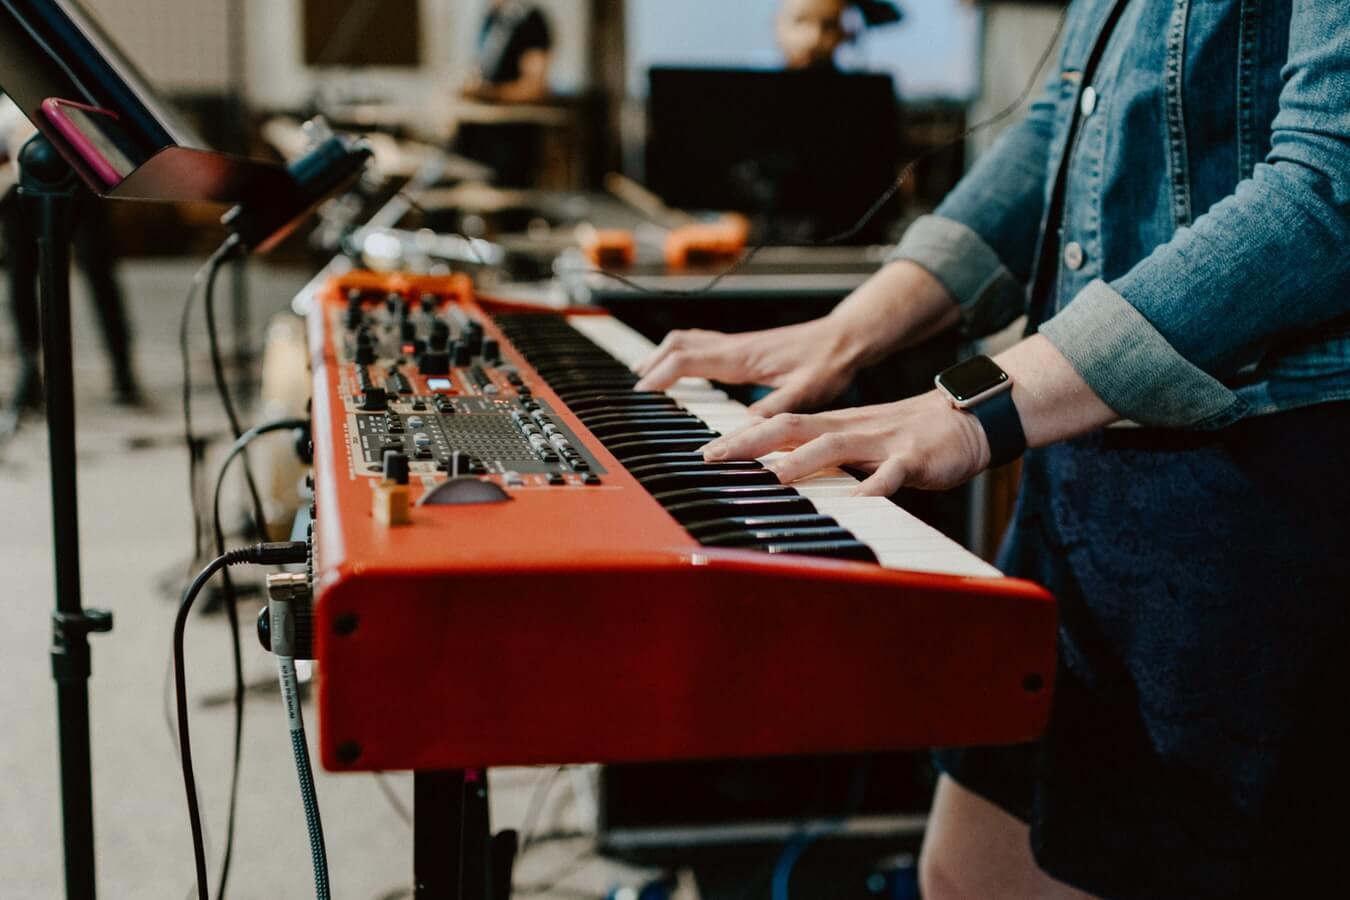 Soundproofing Music studio